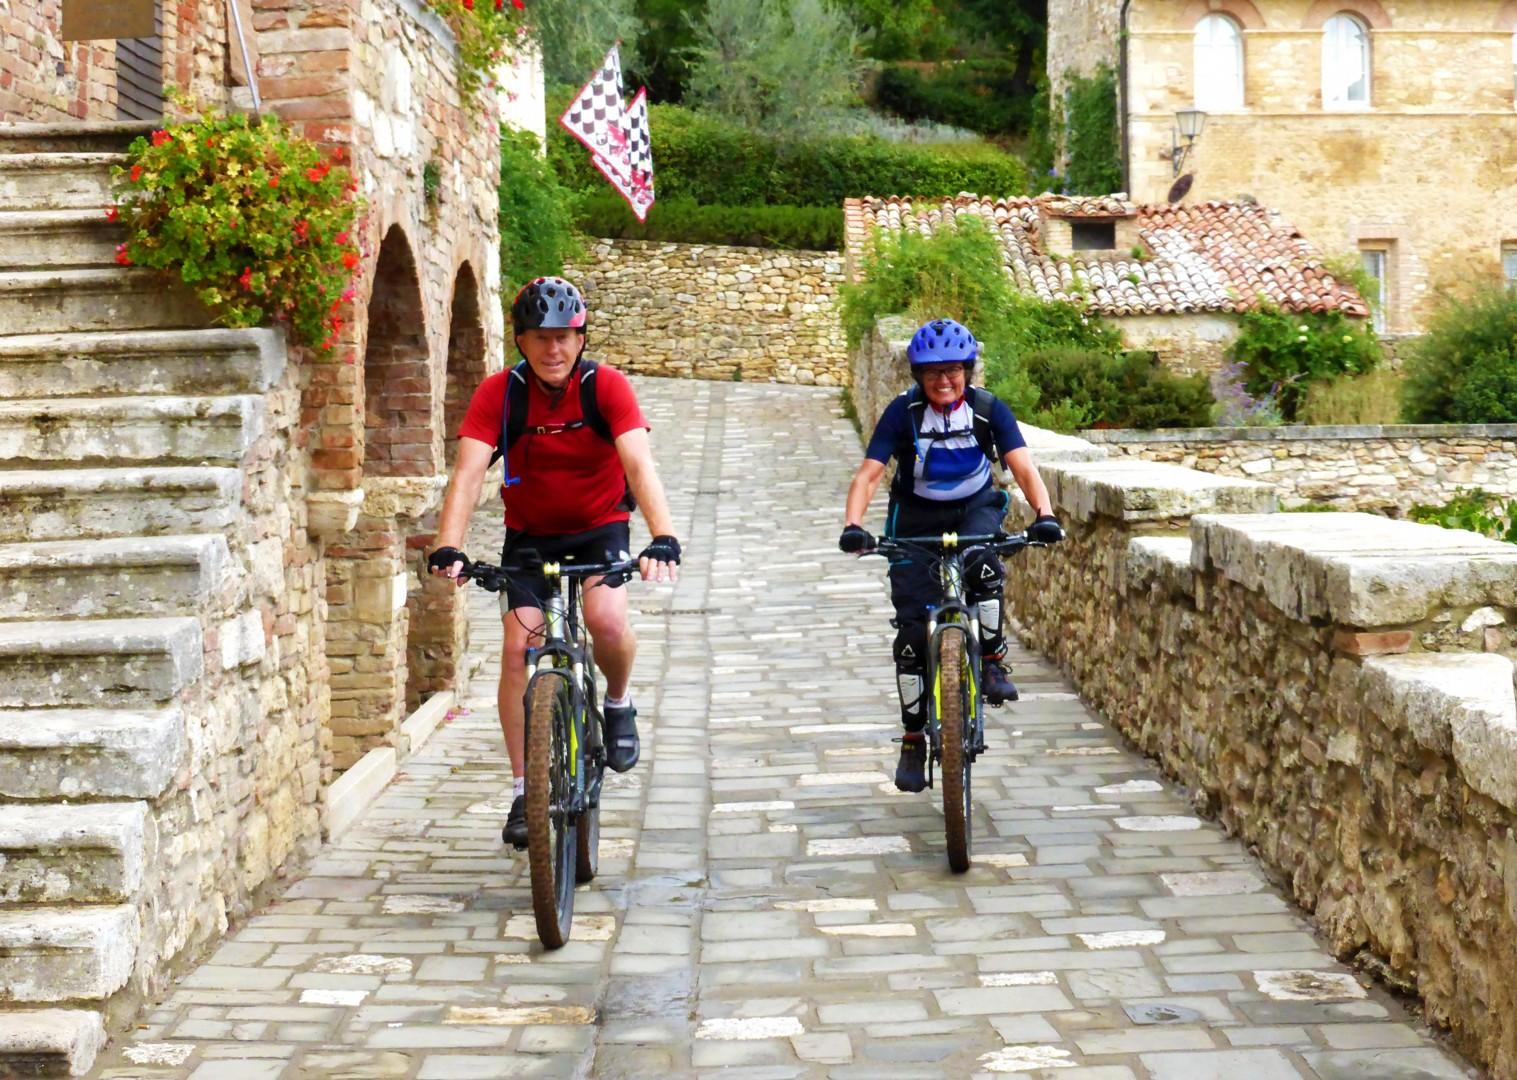 Foto 11-09-17, 09 22 46.jpg - Italy - Tuscany - Sacred Routes  - Self Guided Mountain Bike Holiday - Italia Mountain Biking